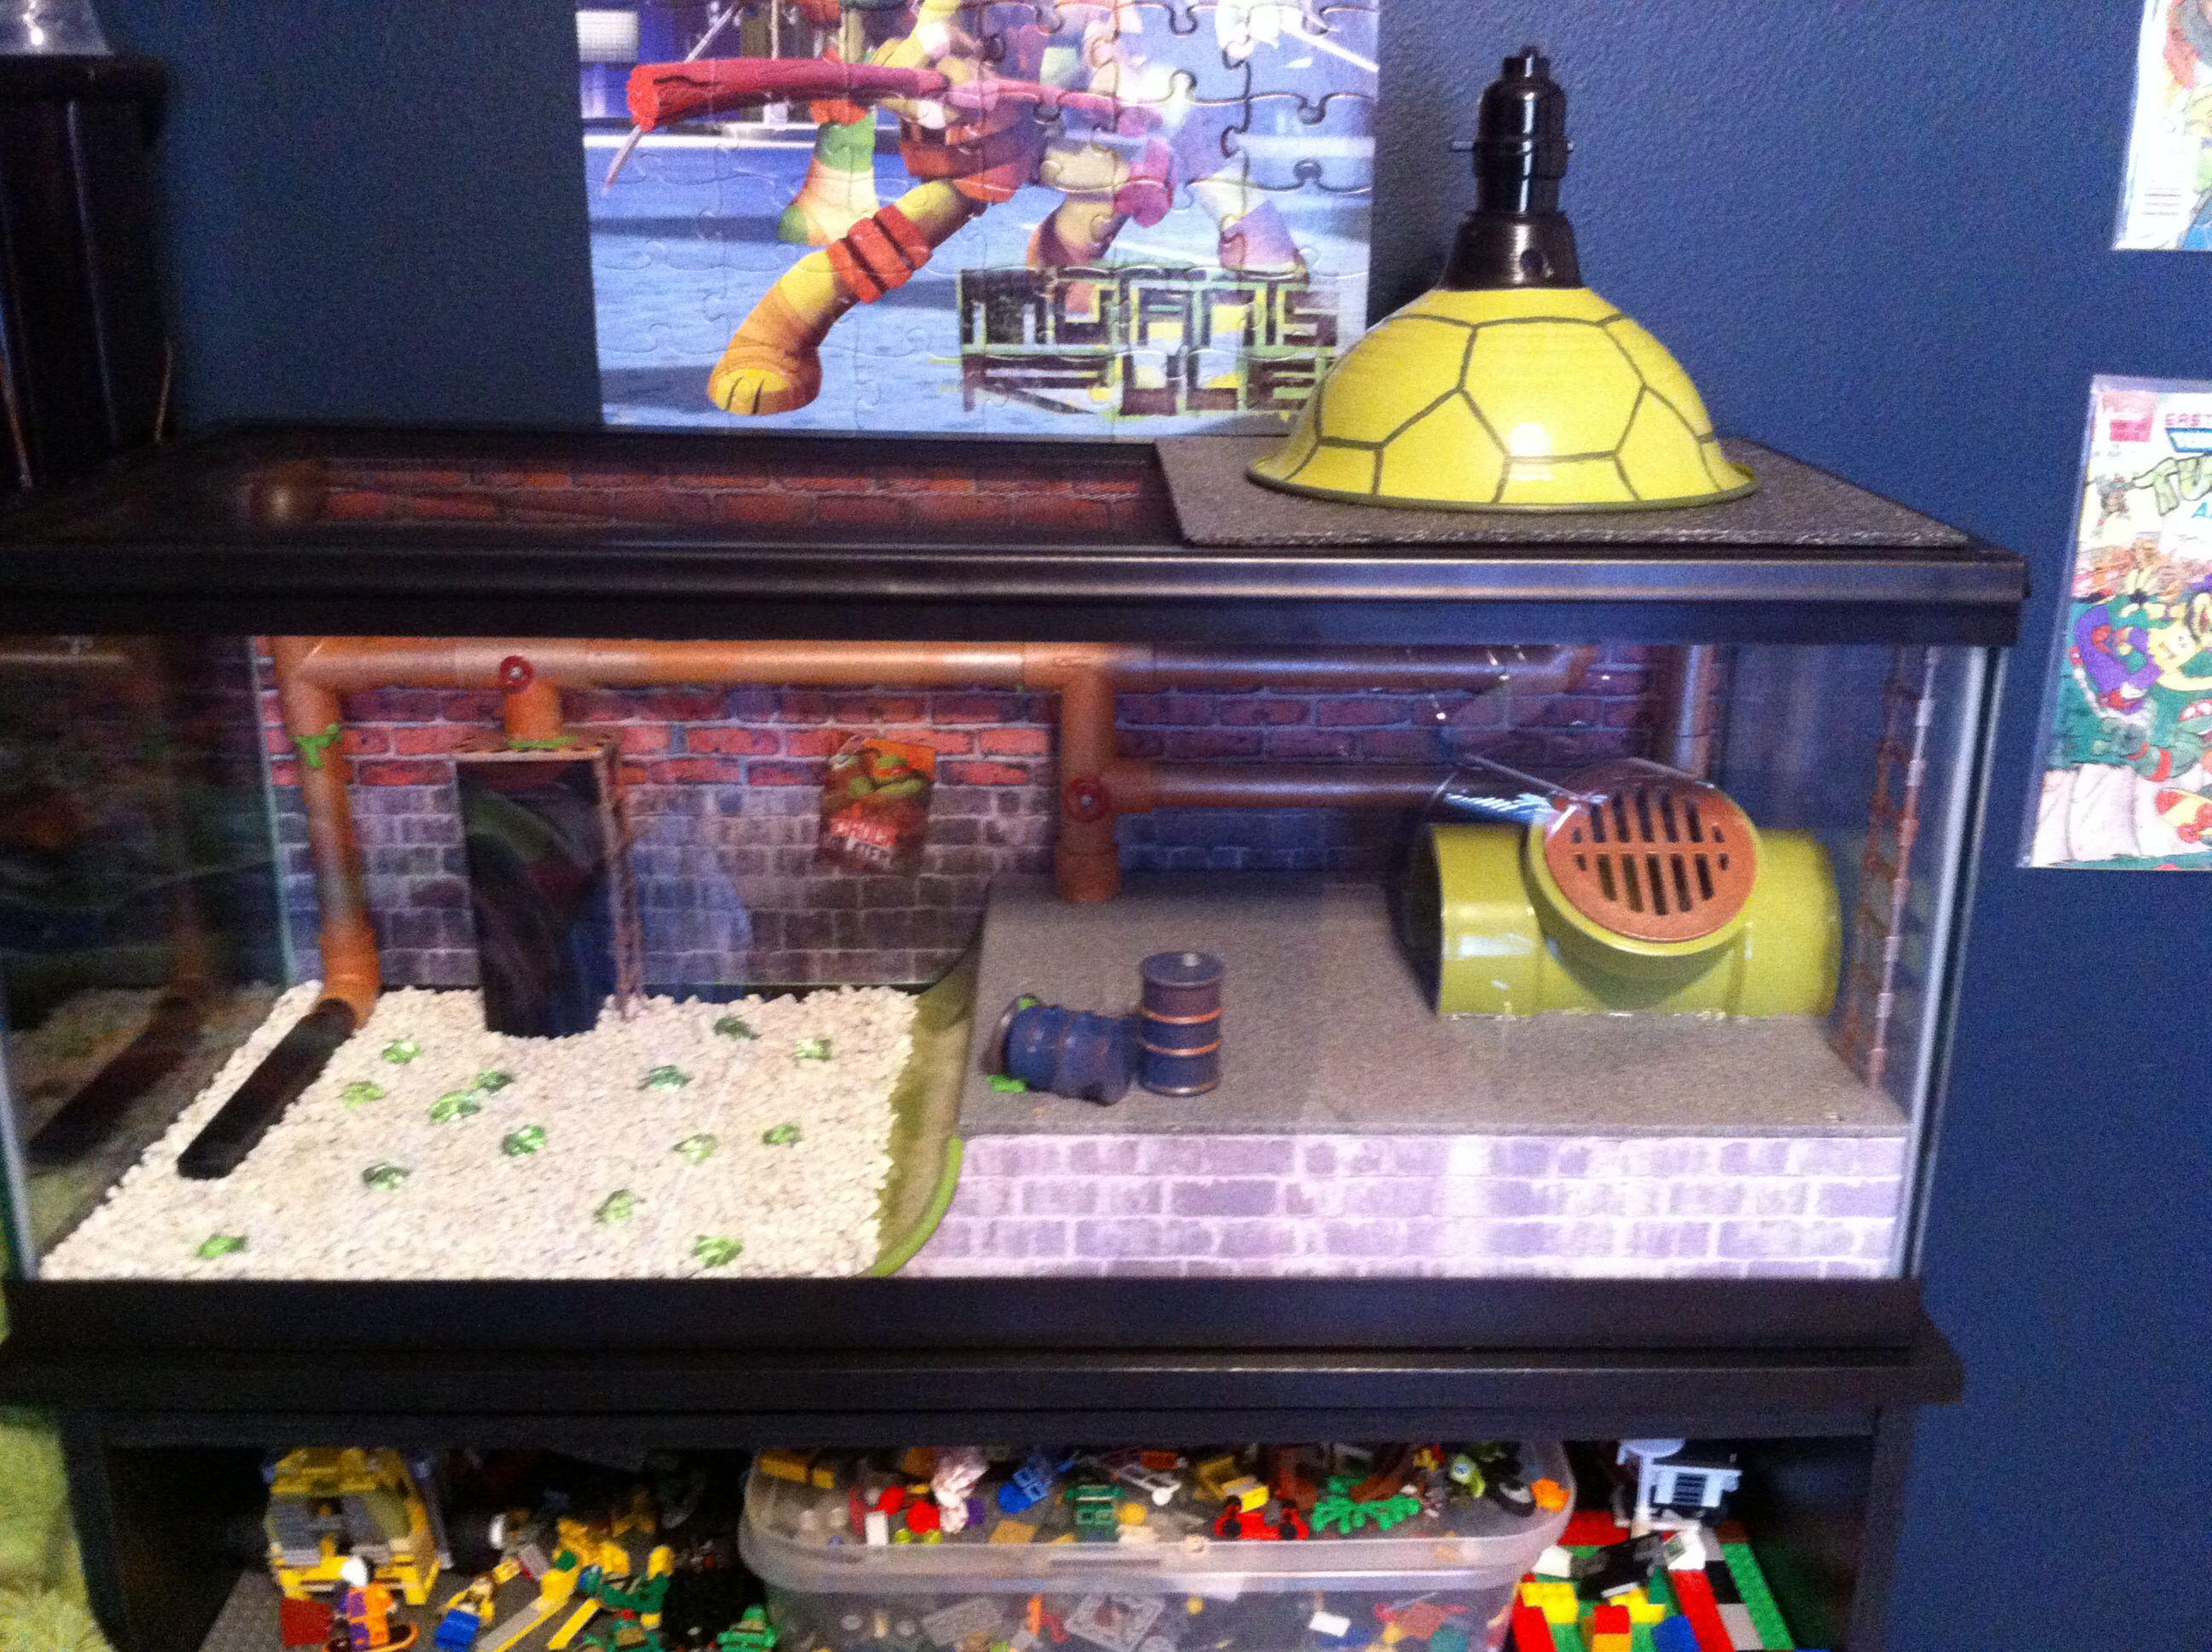 Fish tank in bedroom - Ninja Turtle Aquarium